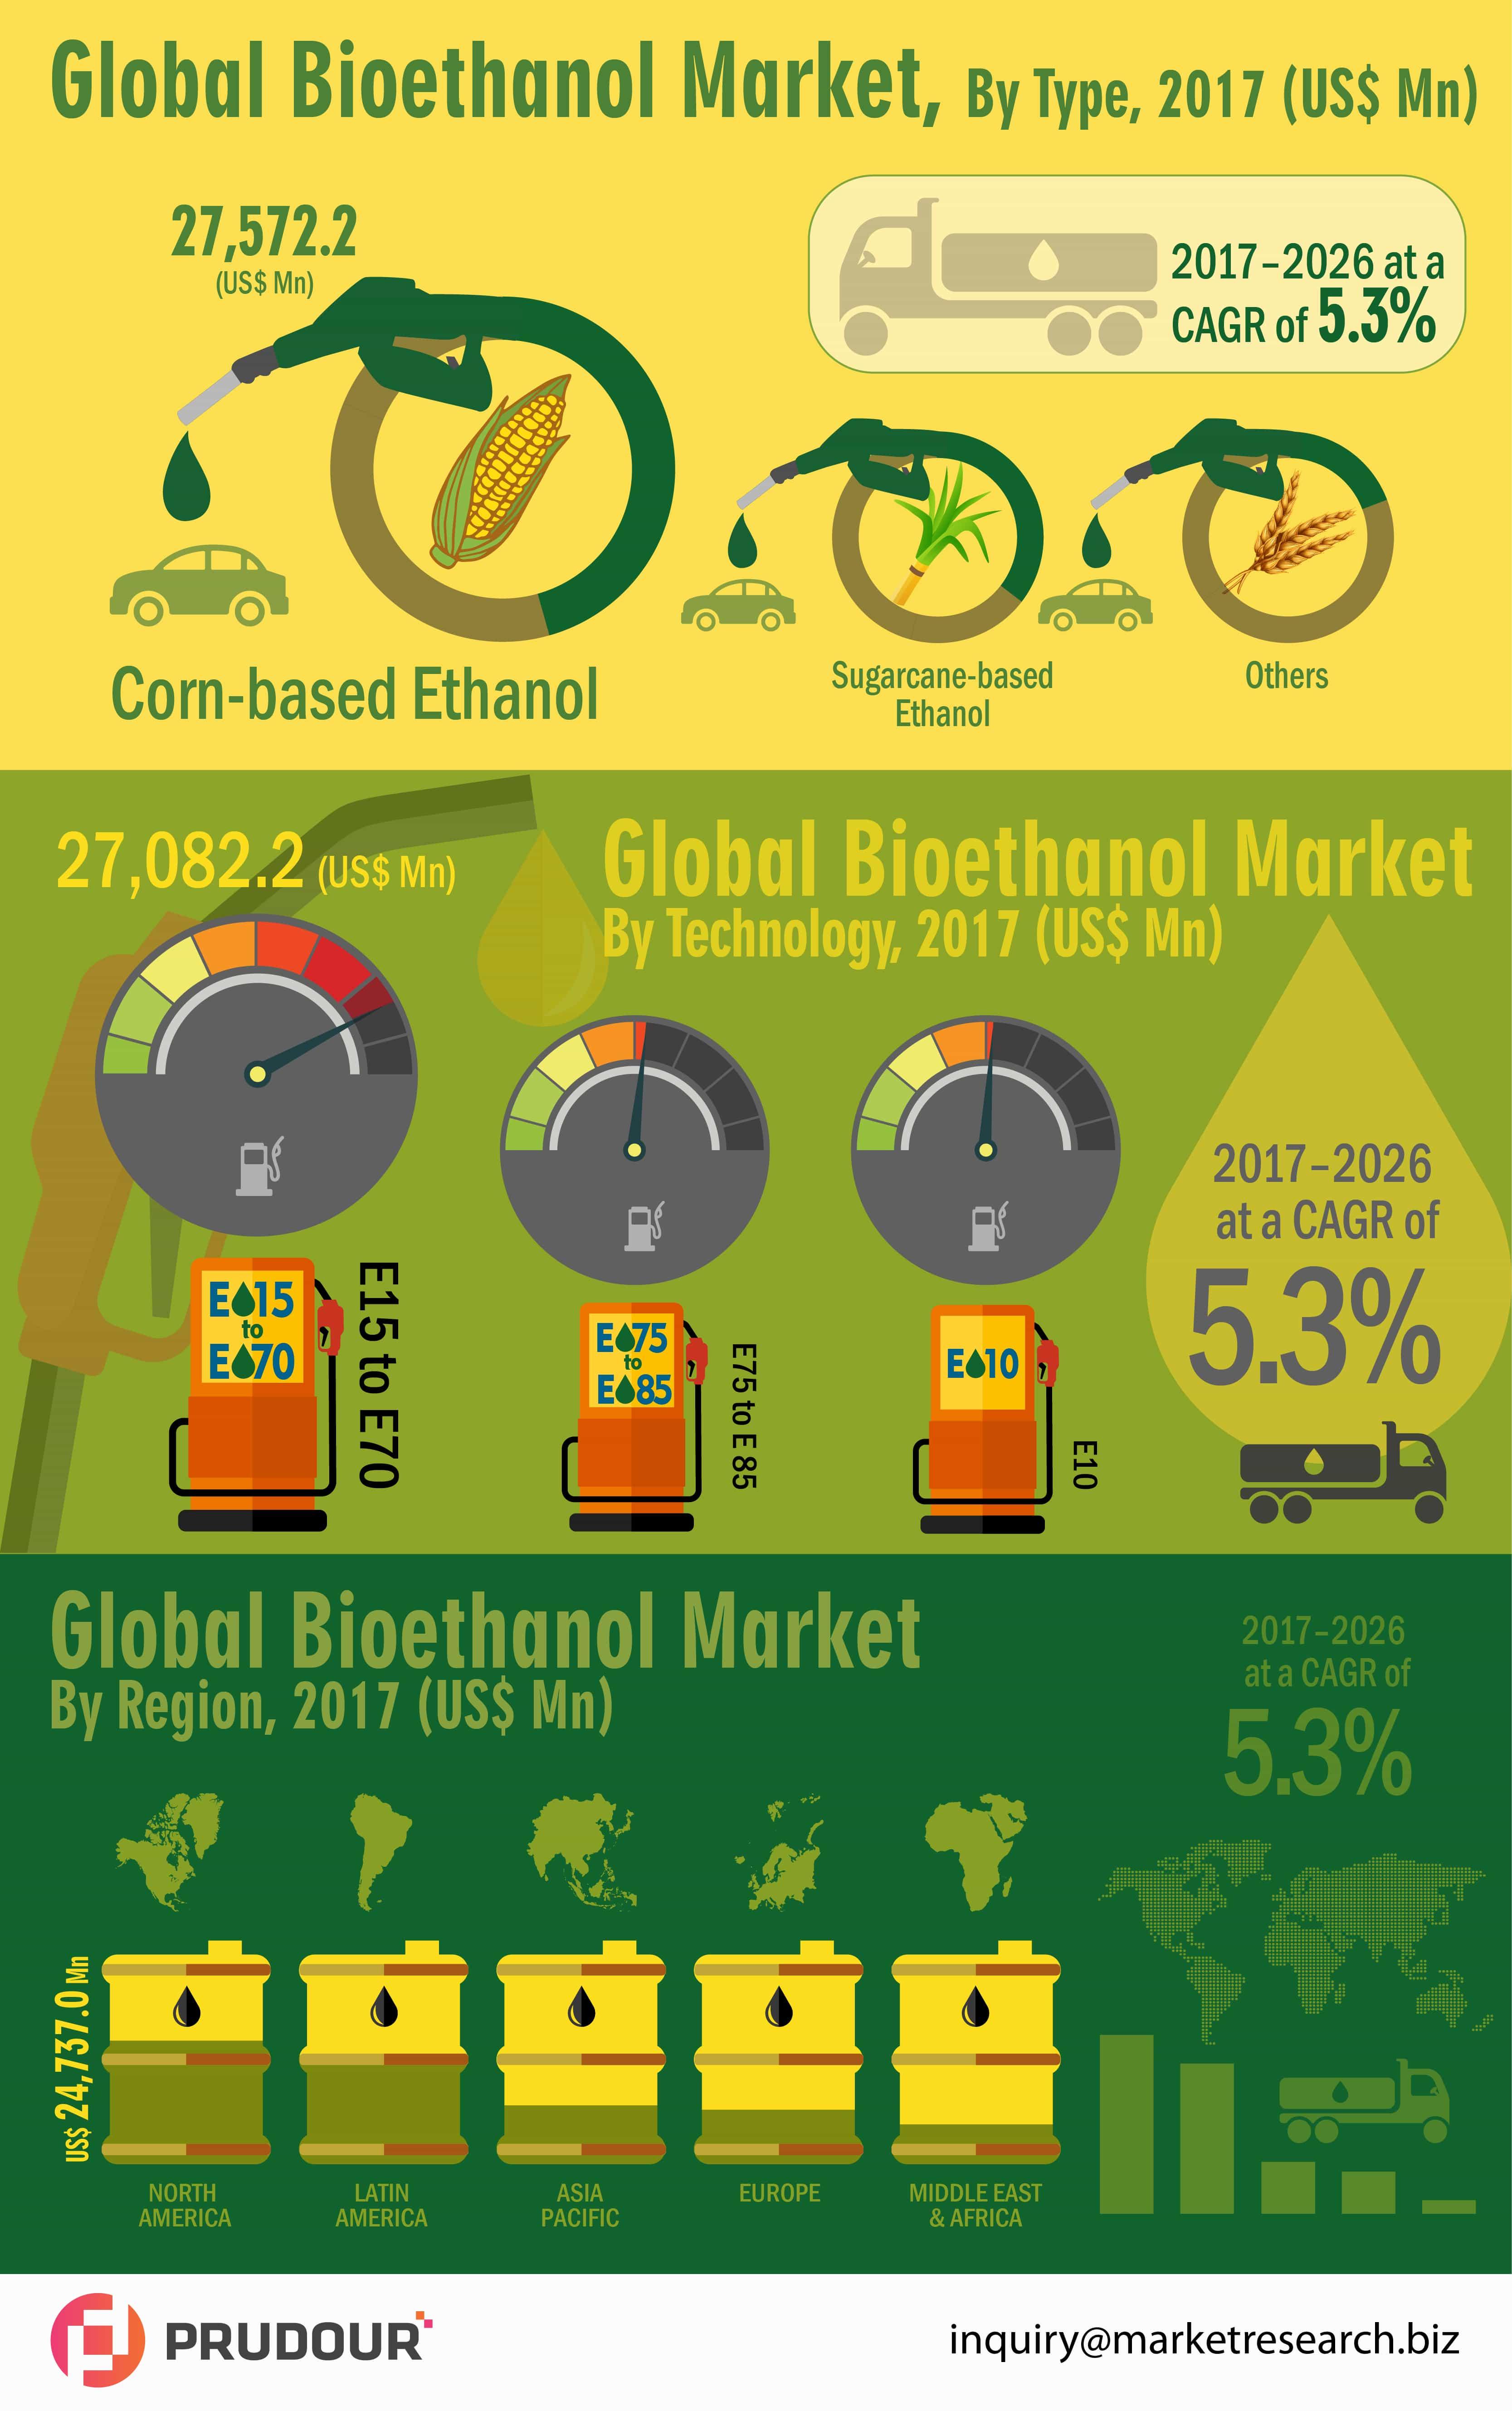 global bioethanol market